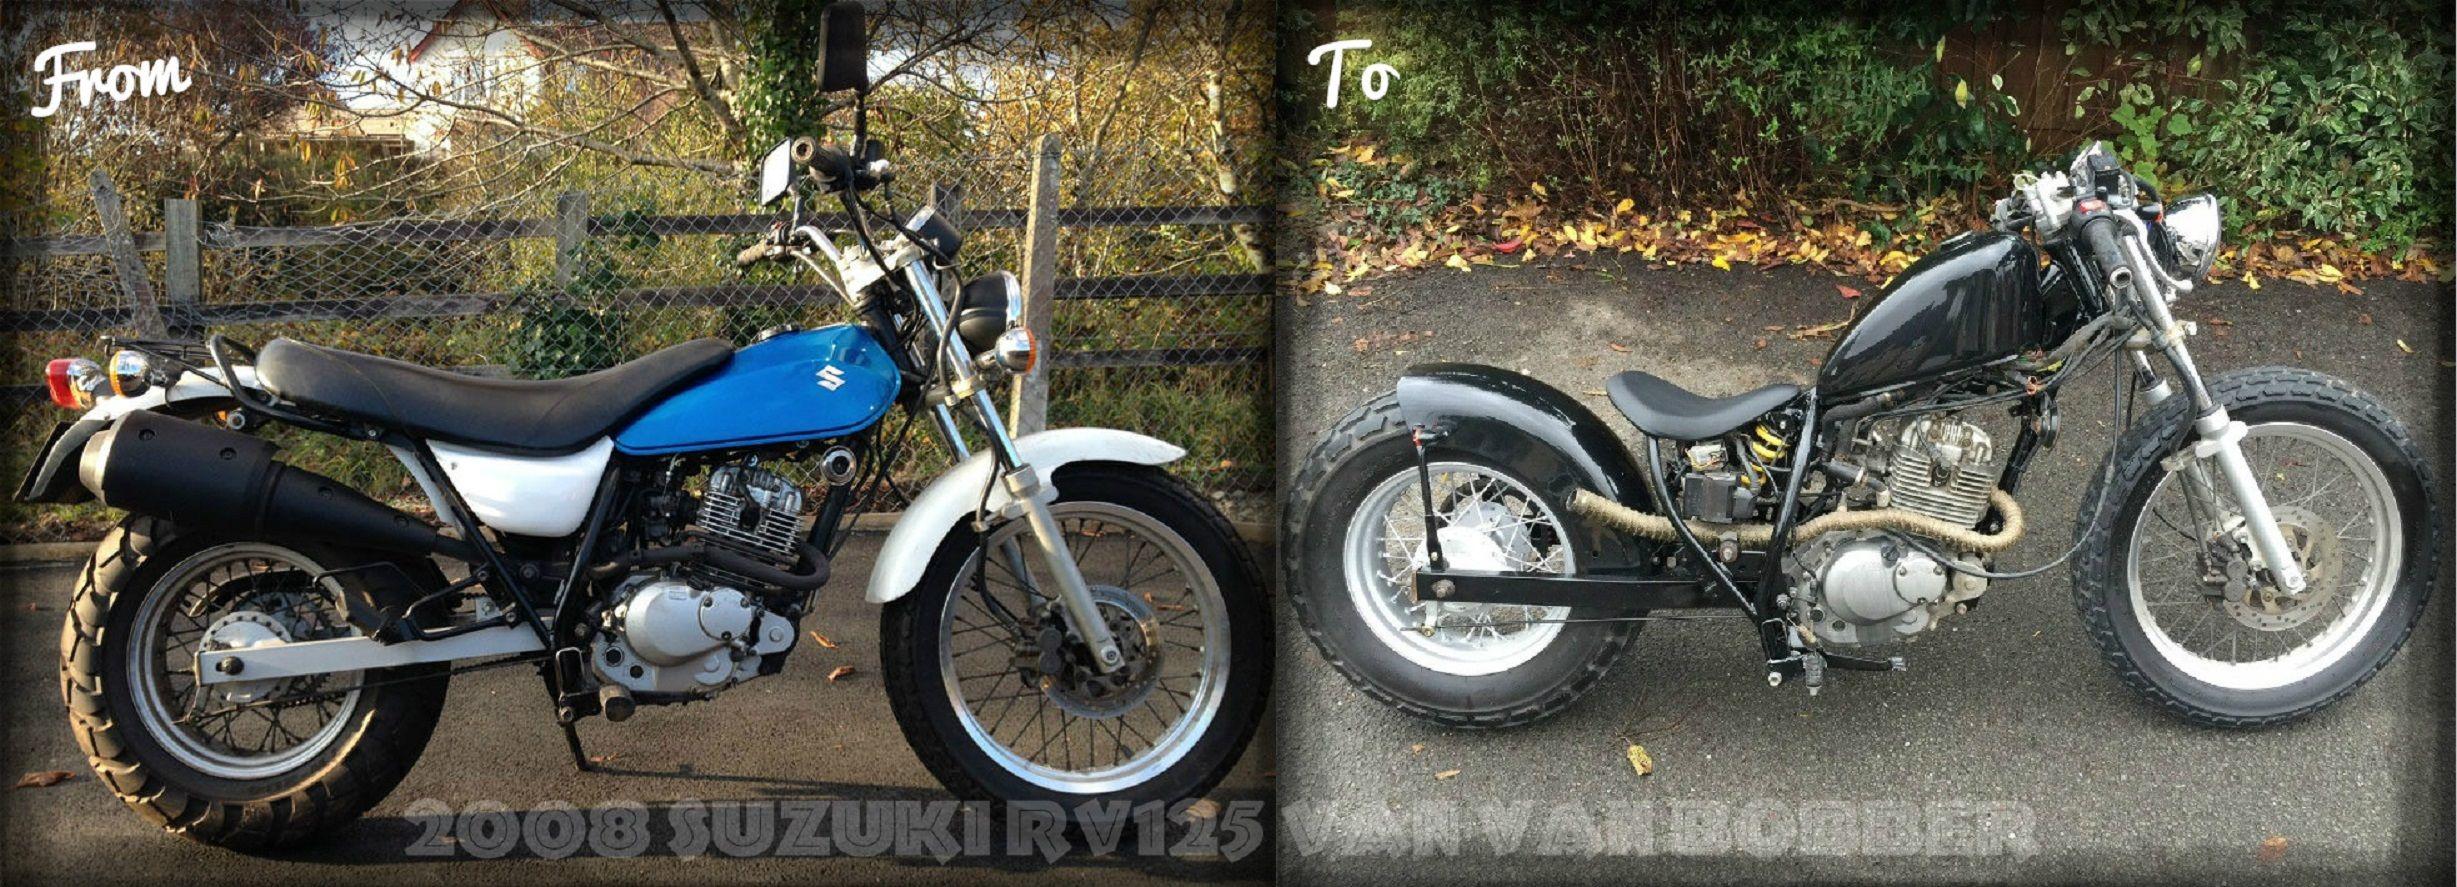 BEFORE - Suzuki RV125 Van Van. http://ebay.co.uk/itm/2003-Suzuki ...